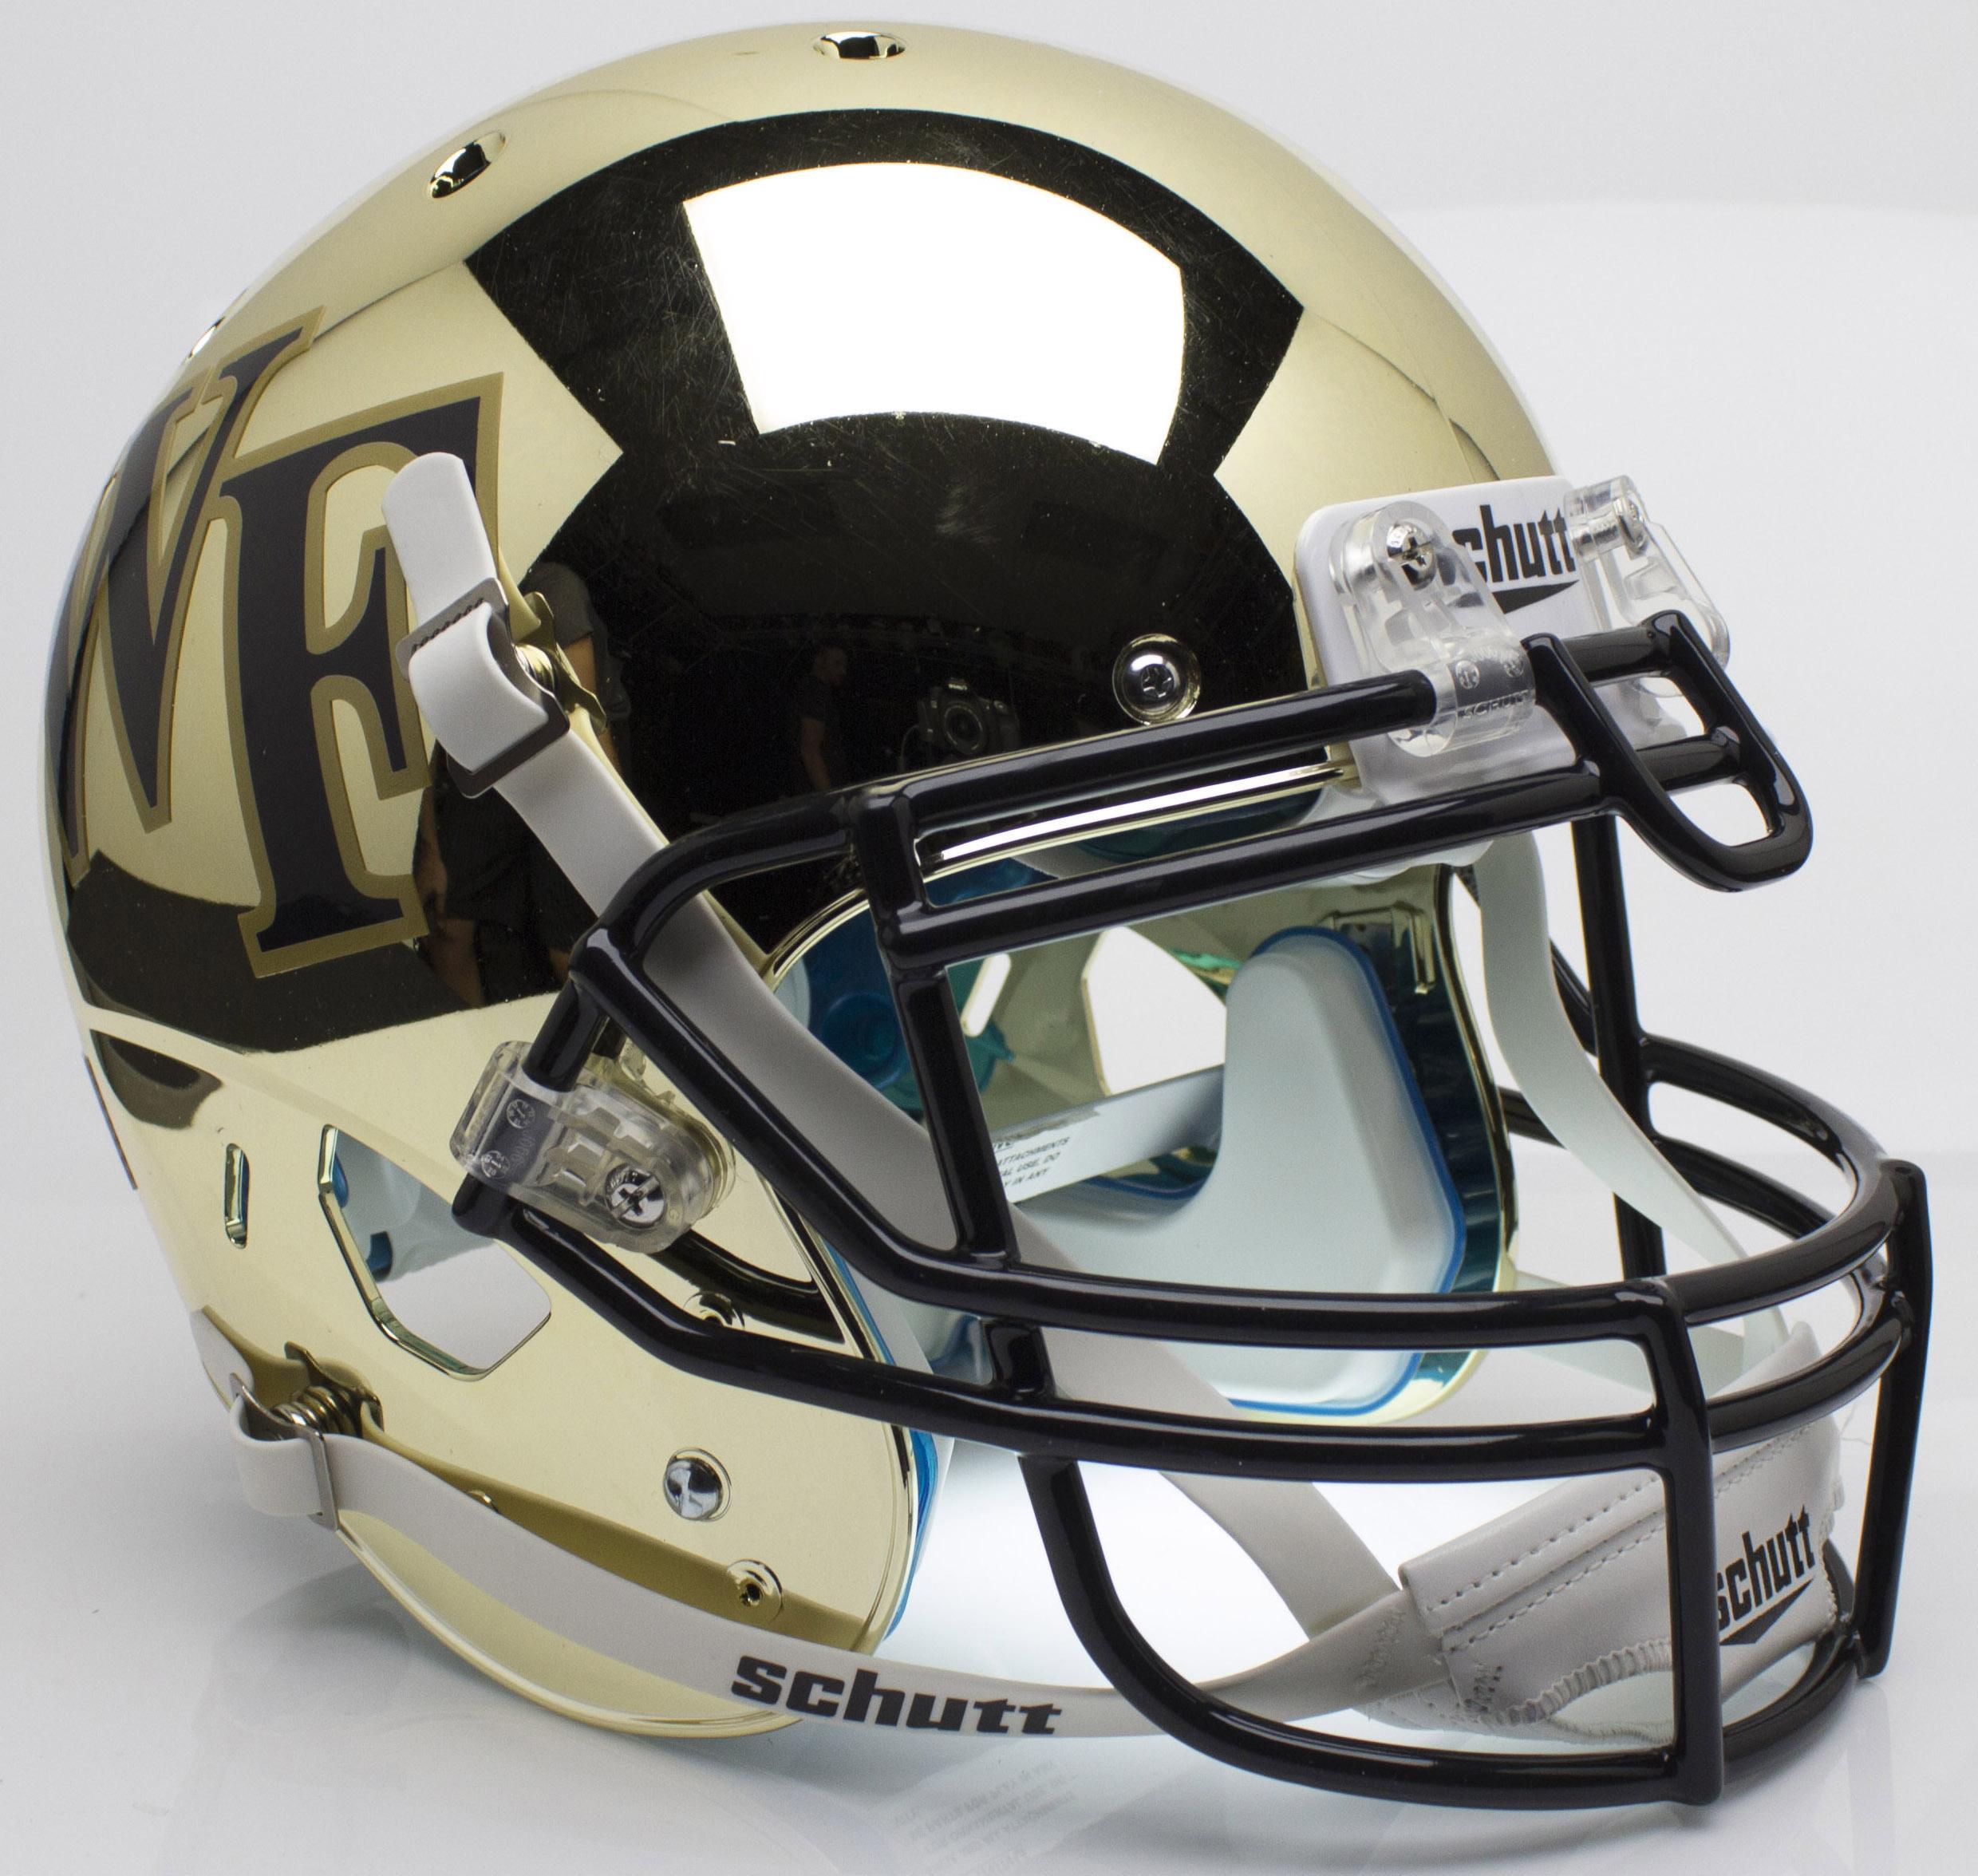 Wake Forest Demon Deacons Authentic College XP Football Helmet Schutt <B>Chrome</B>